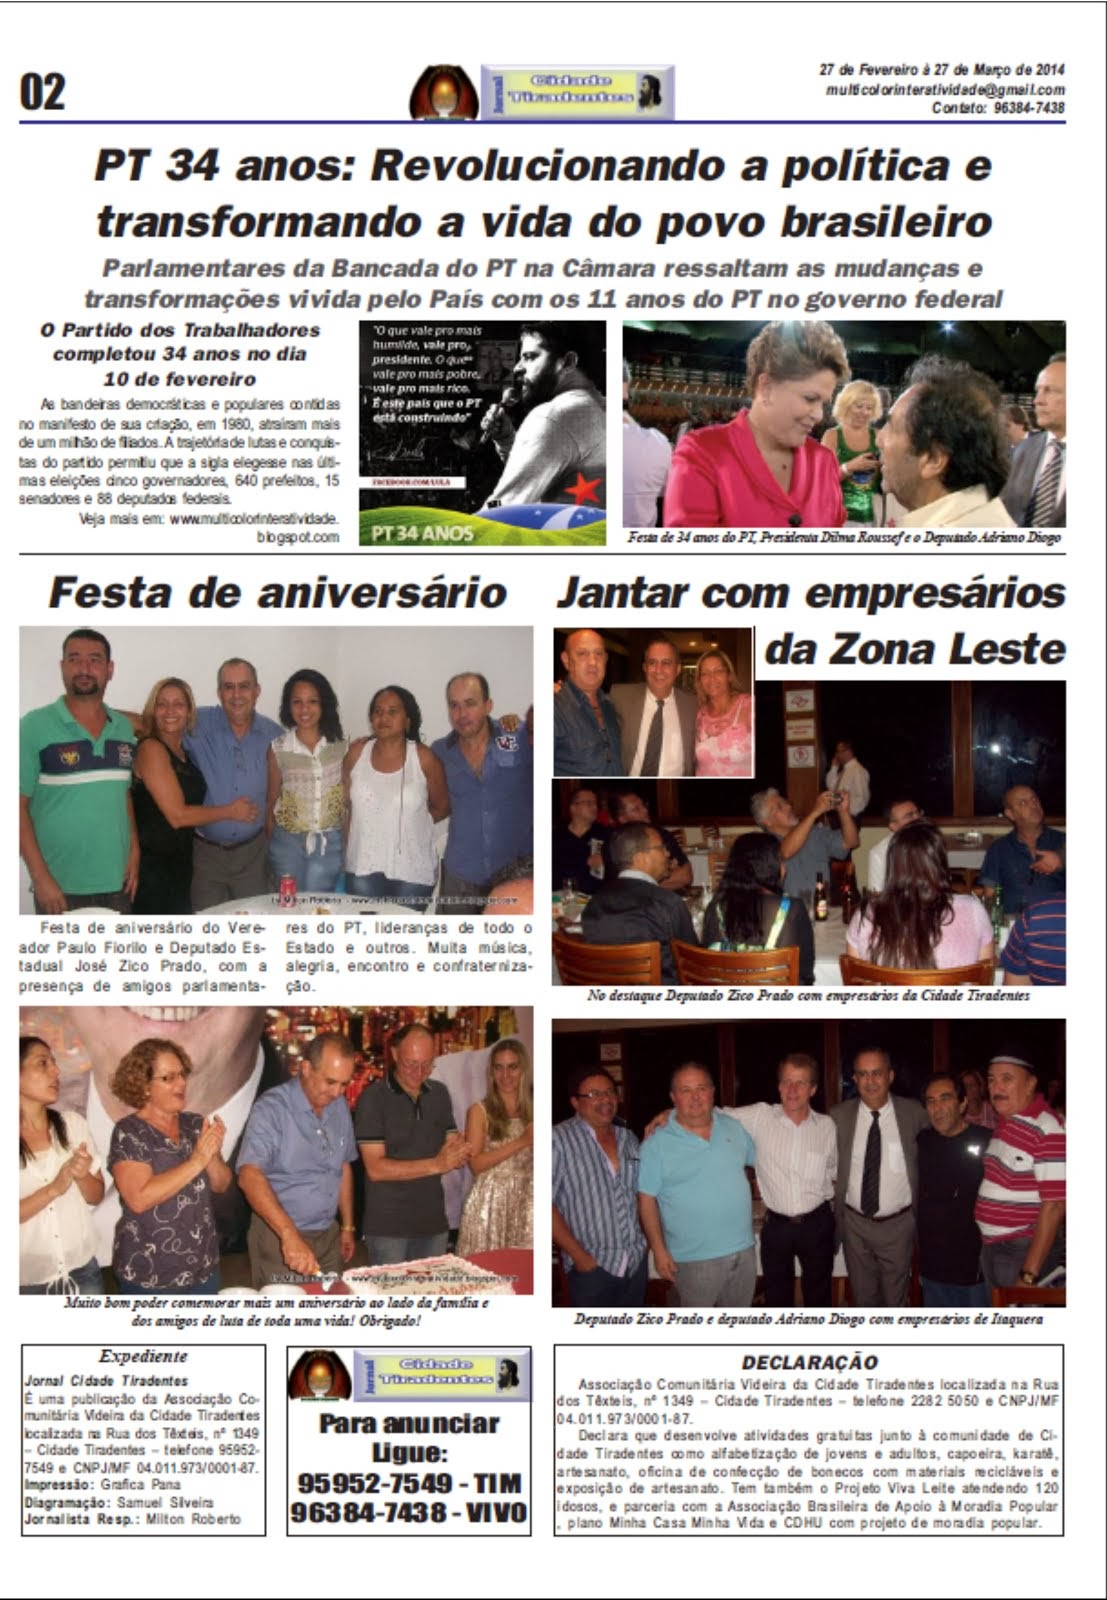 Jornal Cidade Tiradentes nº 52